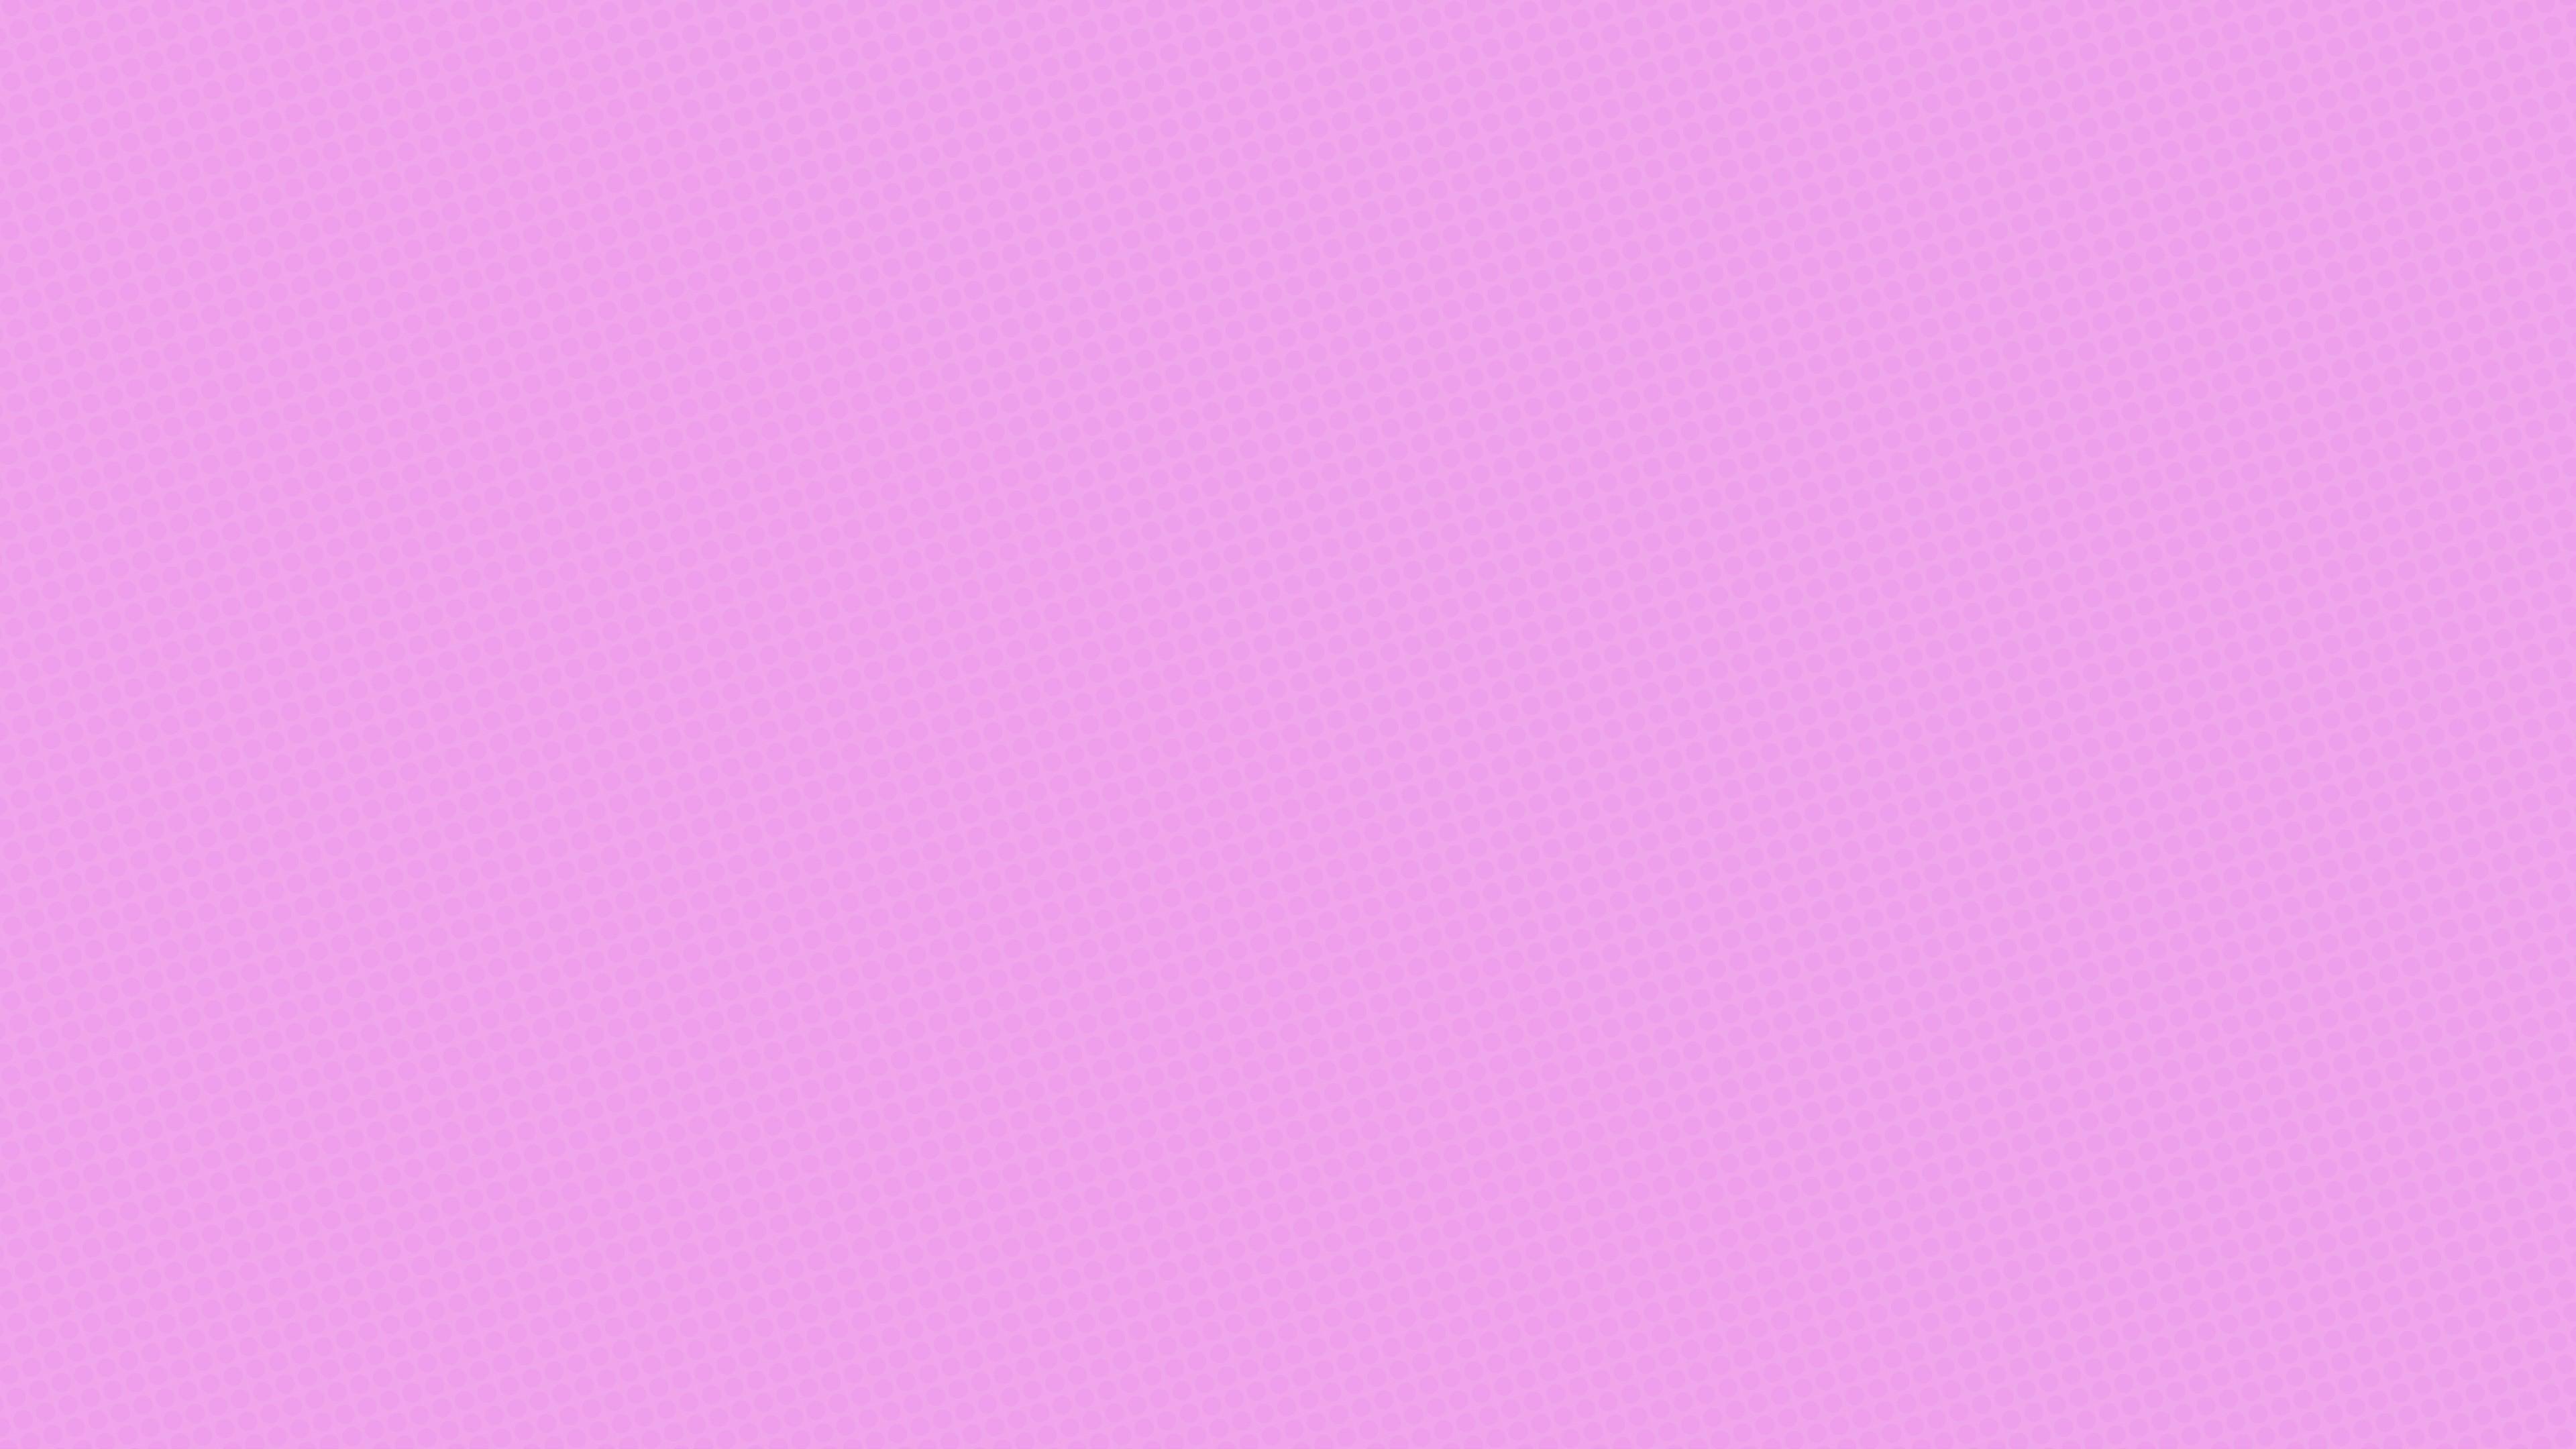 General 3840x2160 polka dots gradient soft gradient  simple simple background pink minimalism